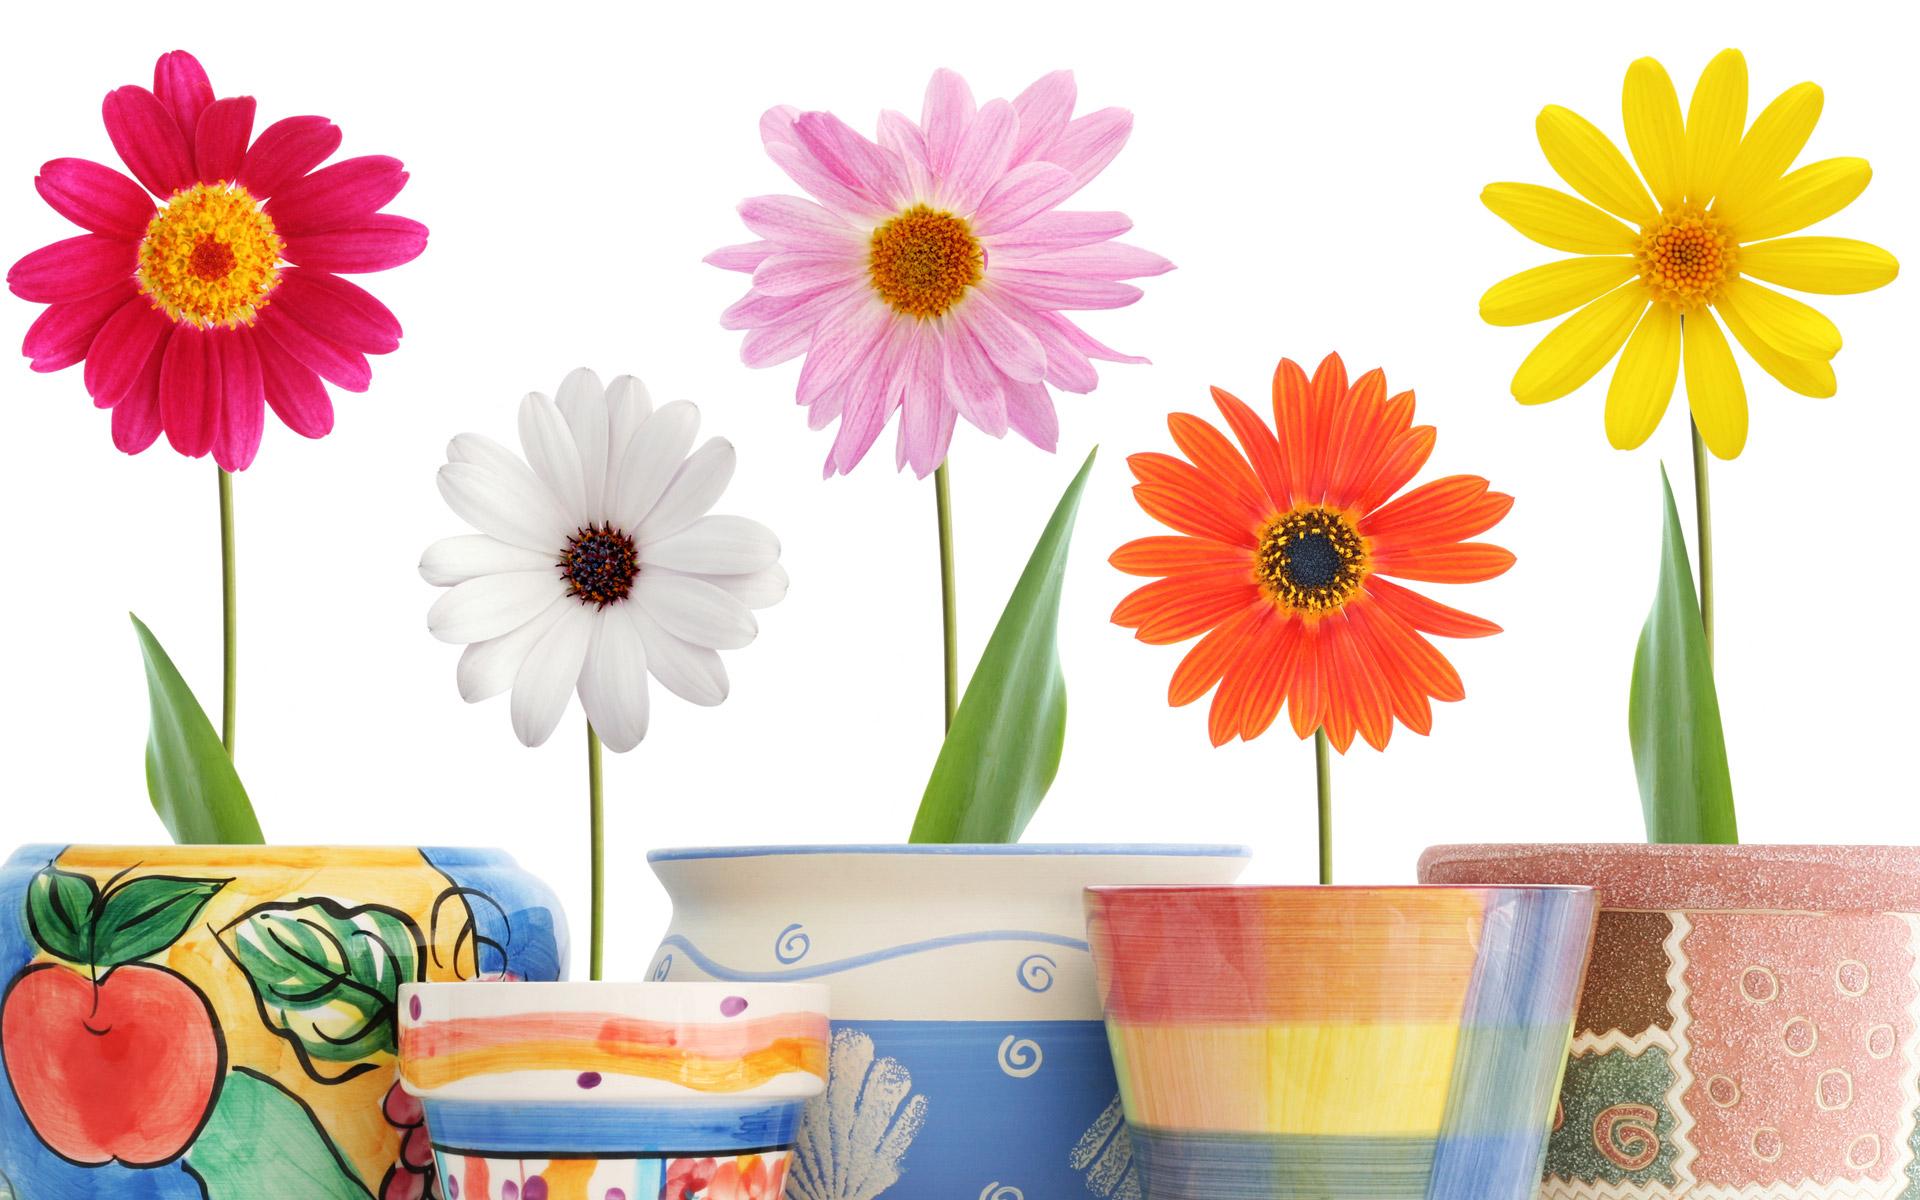 عکس+گل+و+گلدان